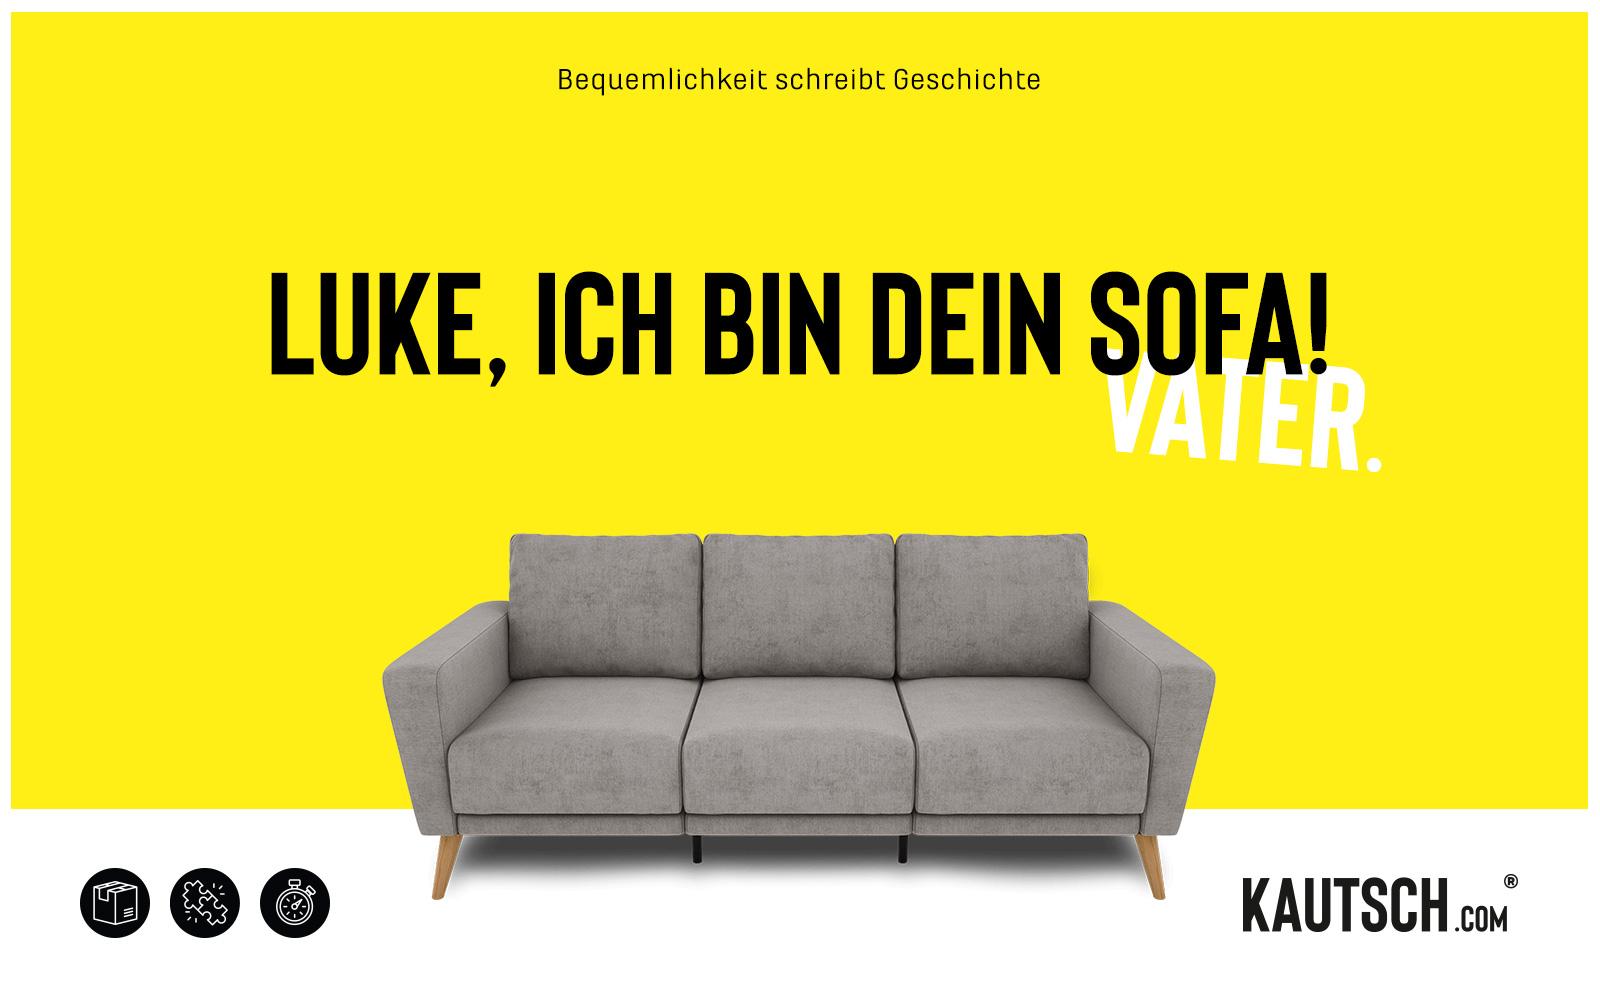 KAUTSCH.com – Kampagne LUKE